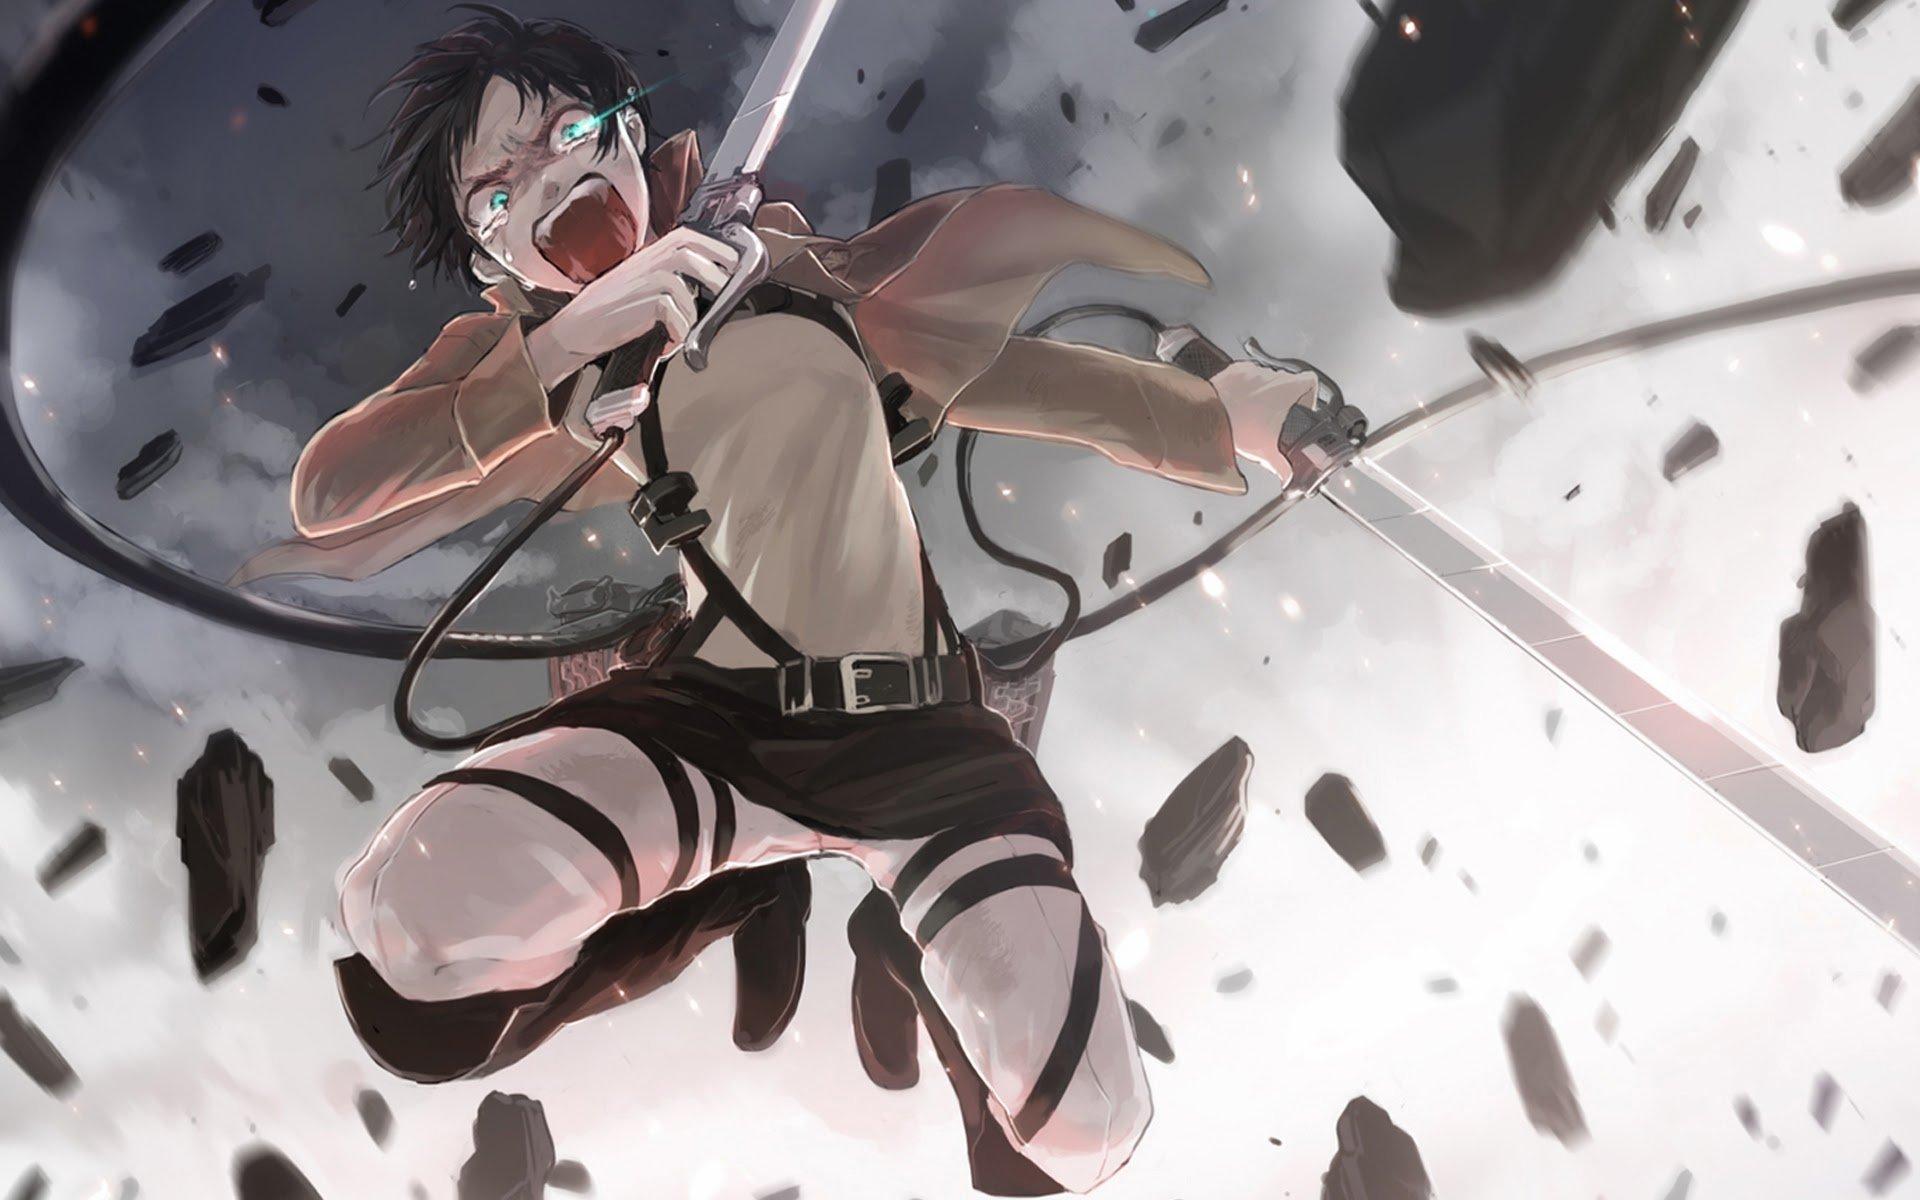 eren jaeger anime attack on titan shingeki no kyojin 1920x1200 9f 1920x1200